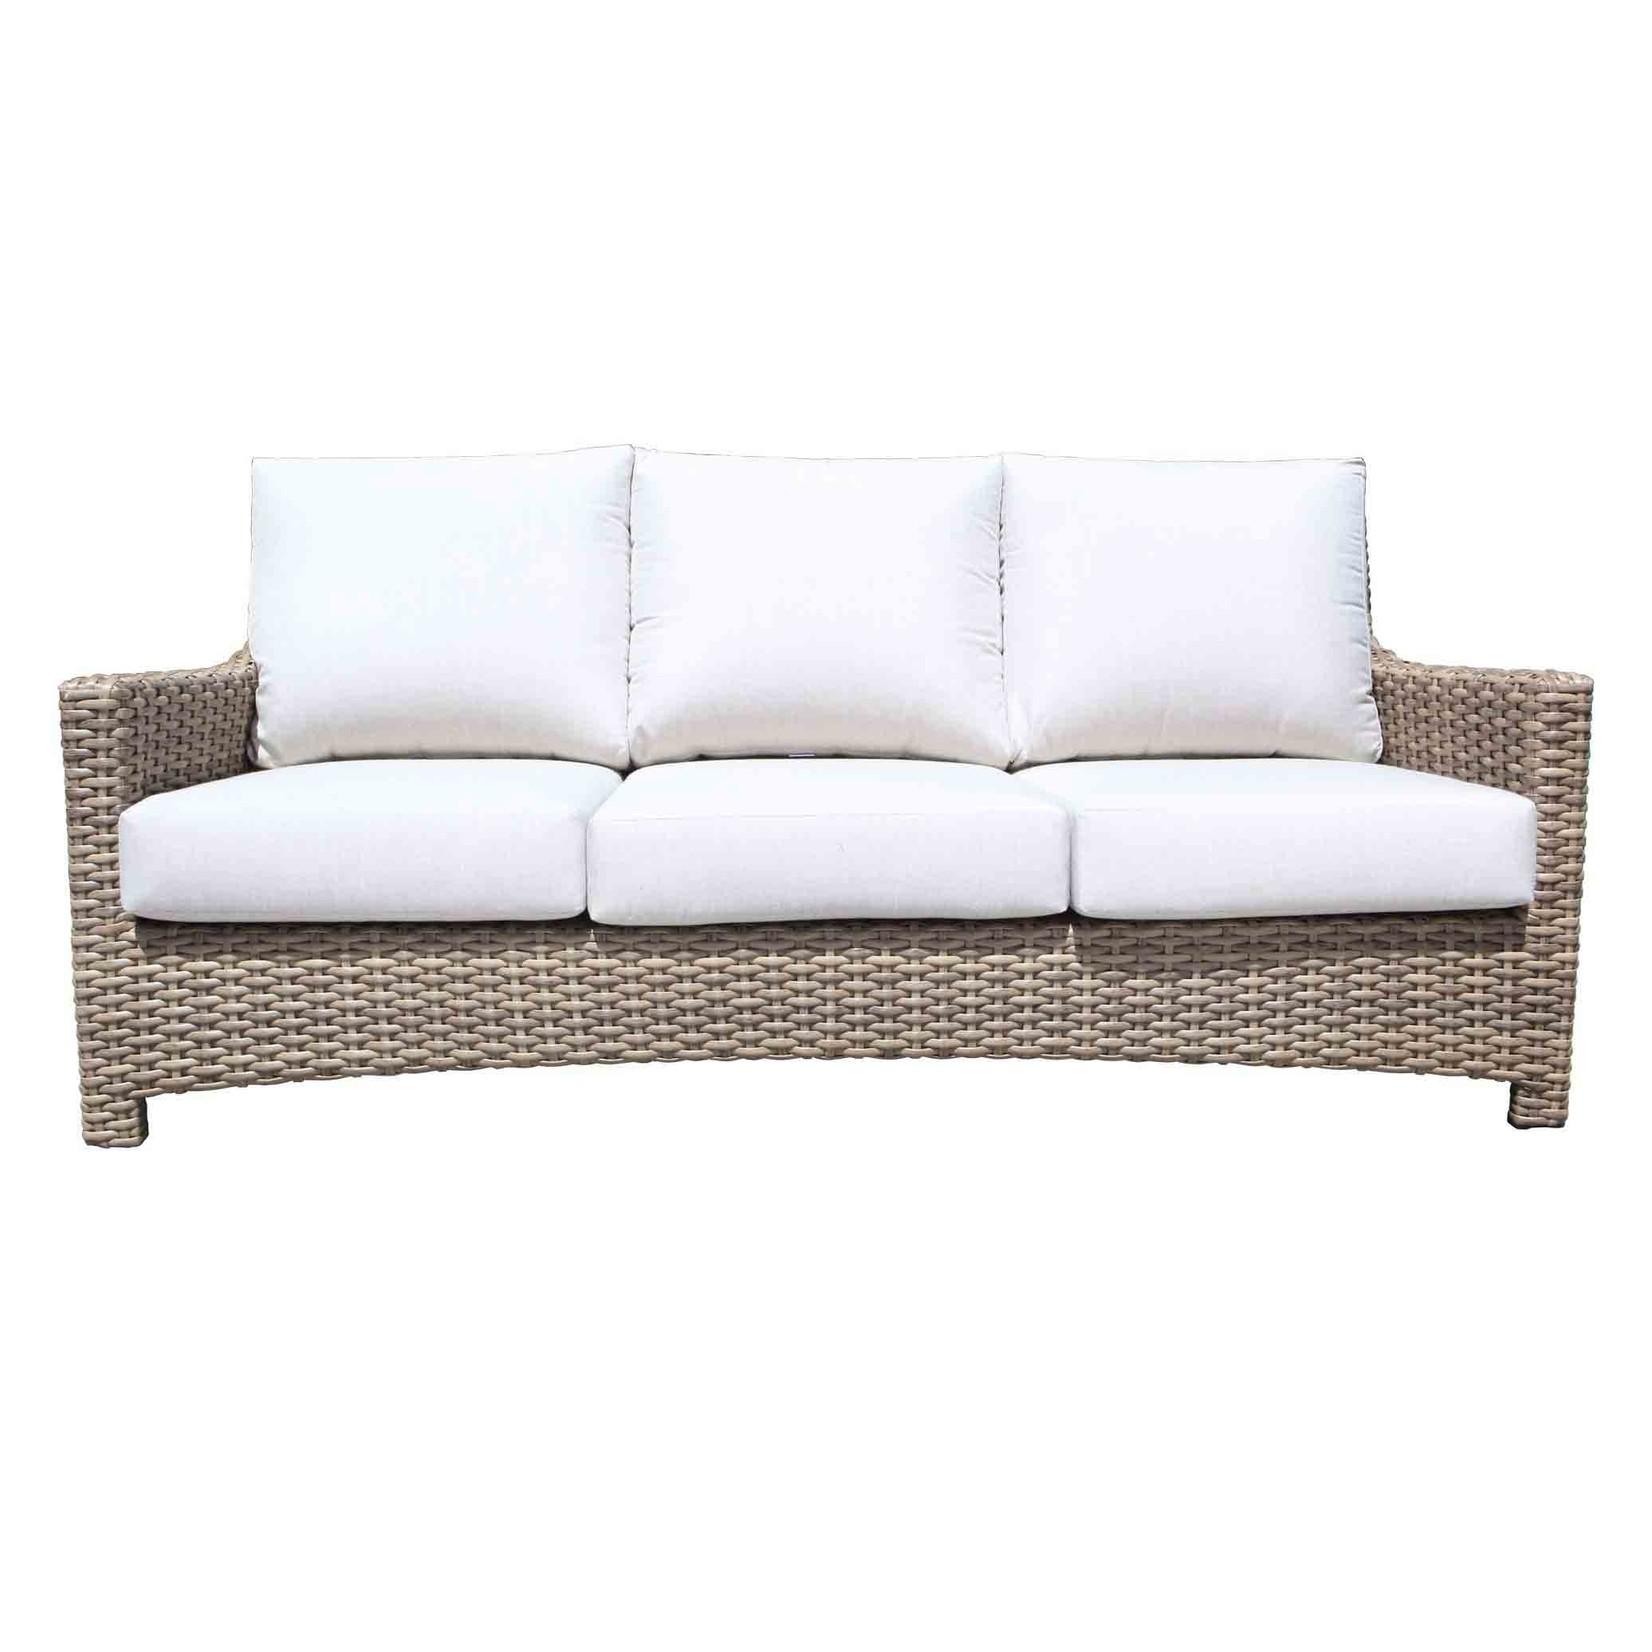 Cabana Coast Riverside Sofa - Drift Teak